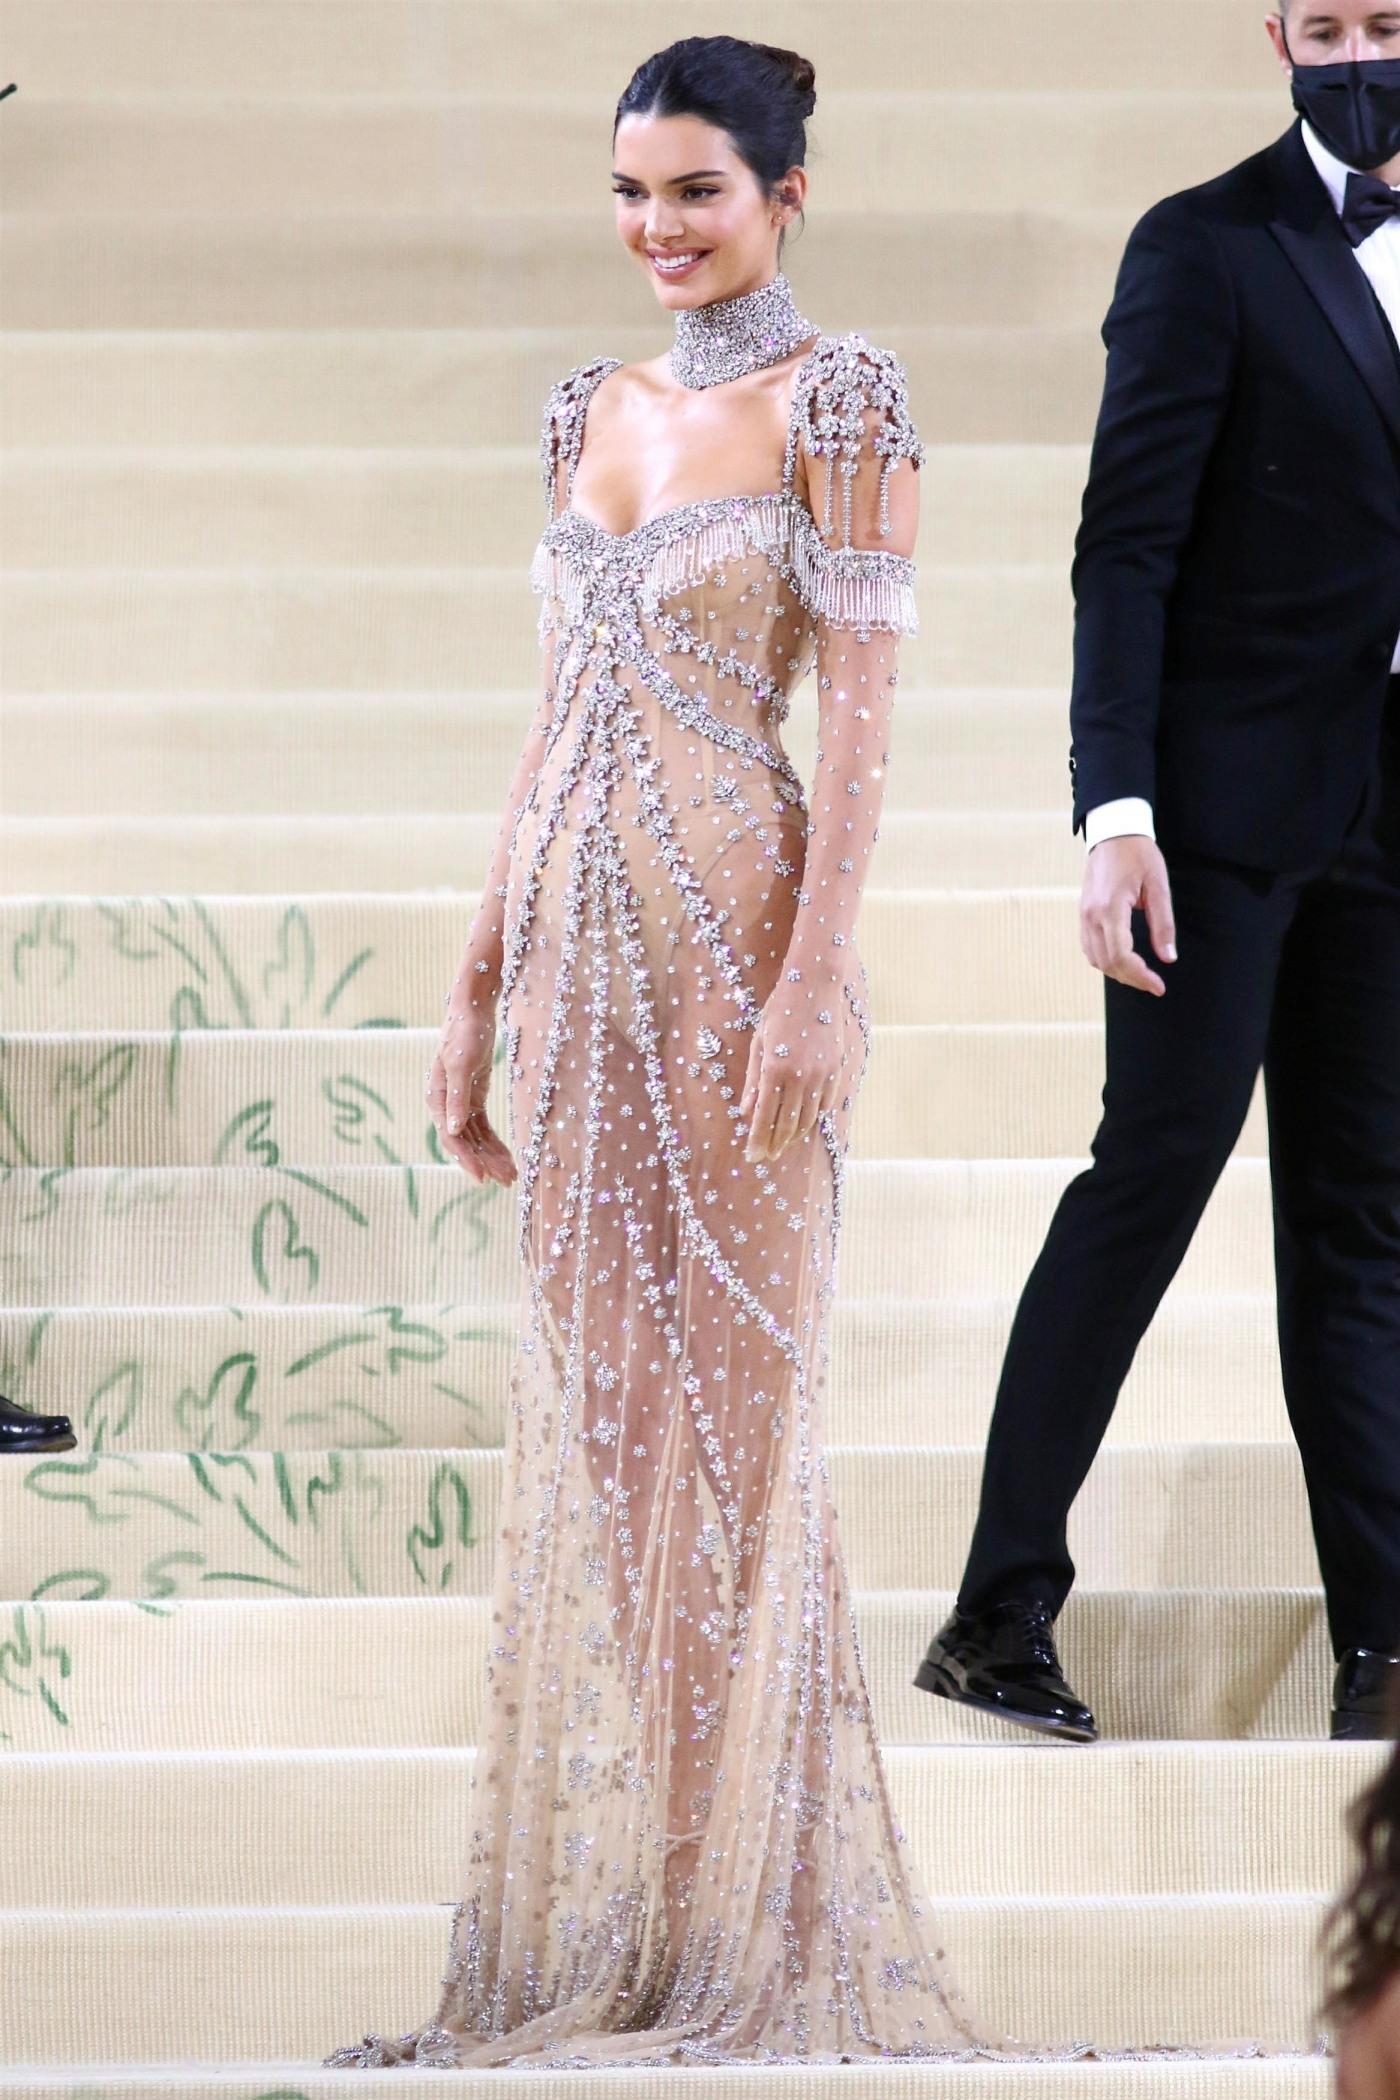 Kim Kardashian and Kendall Jenner attend the Met Gala